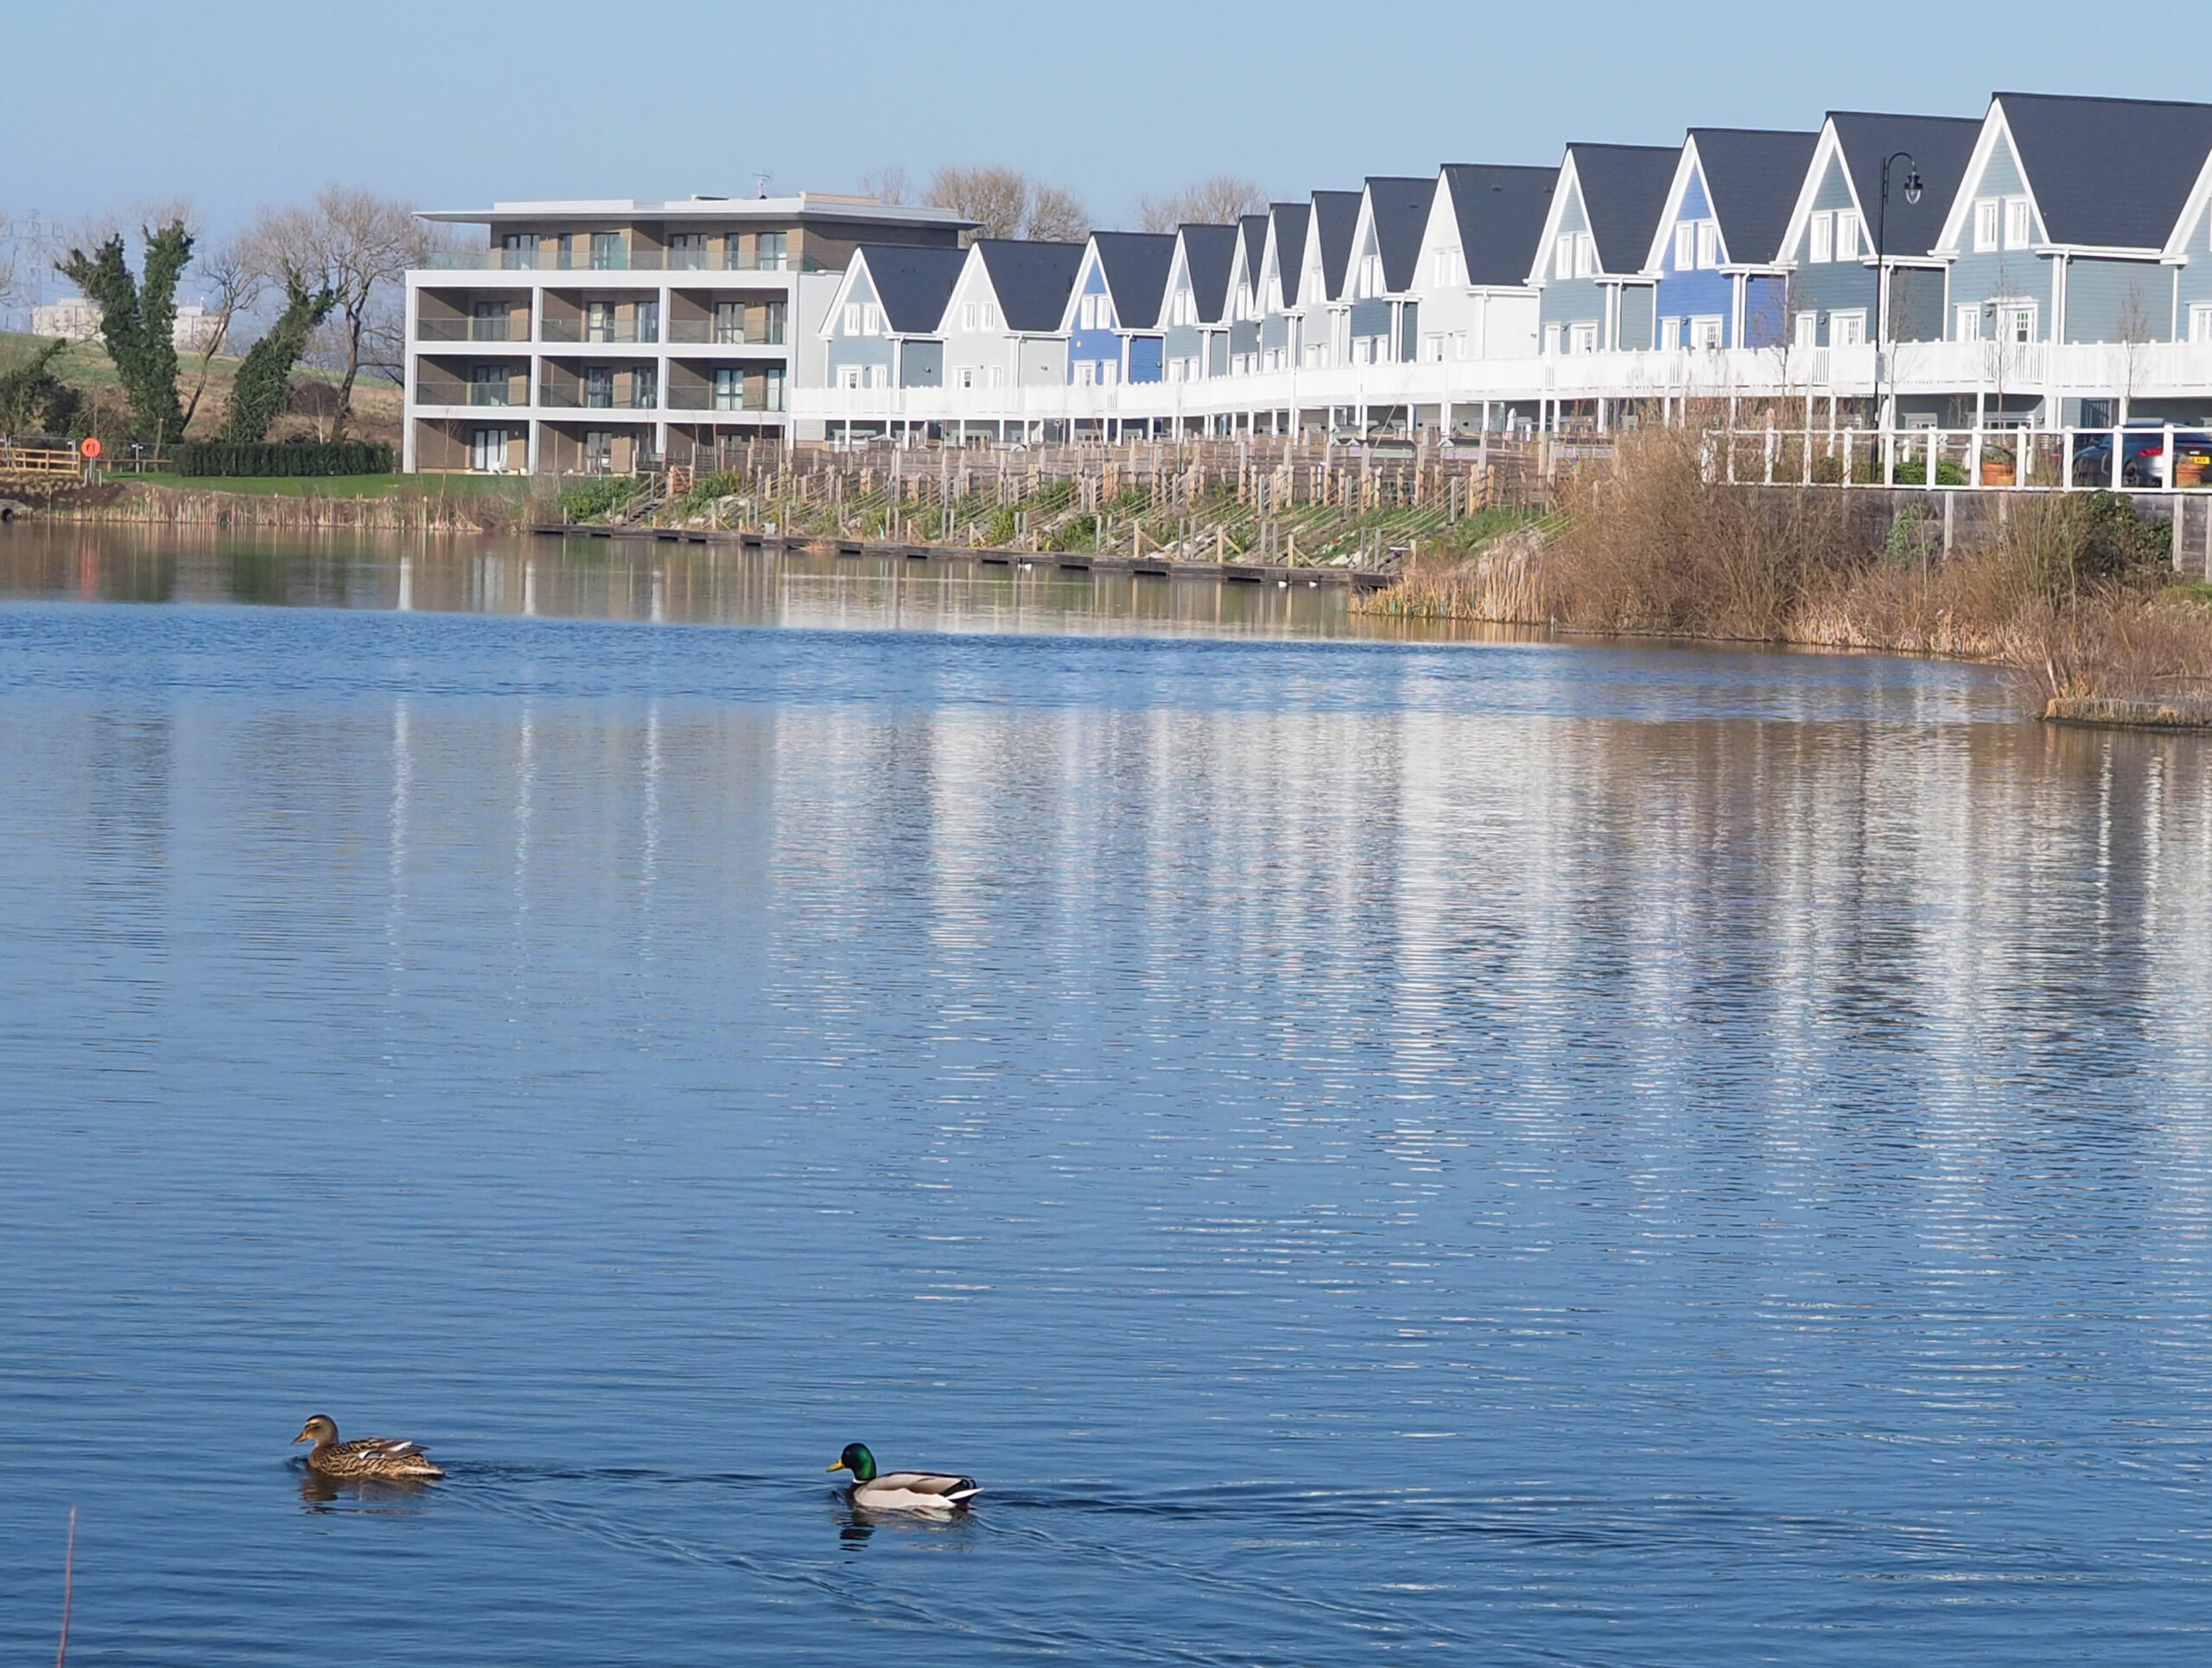 Green park village in Reading